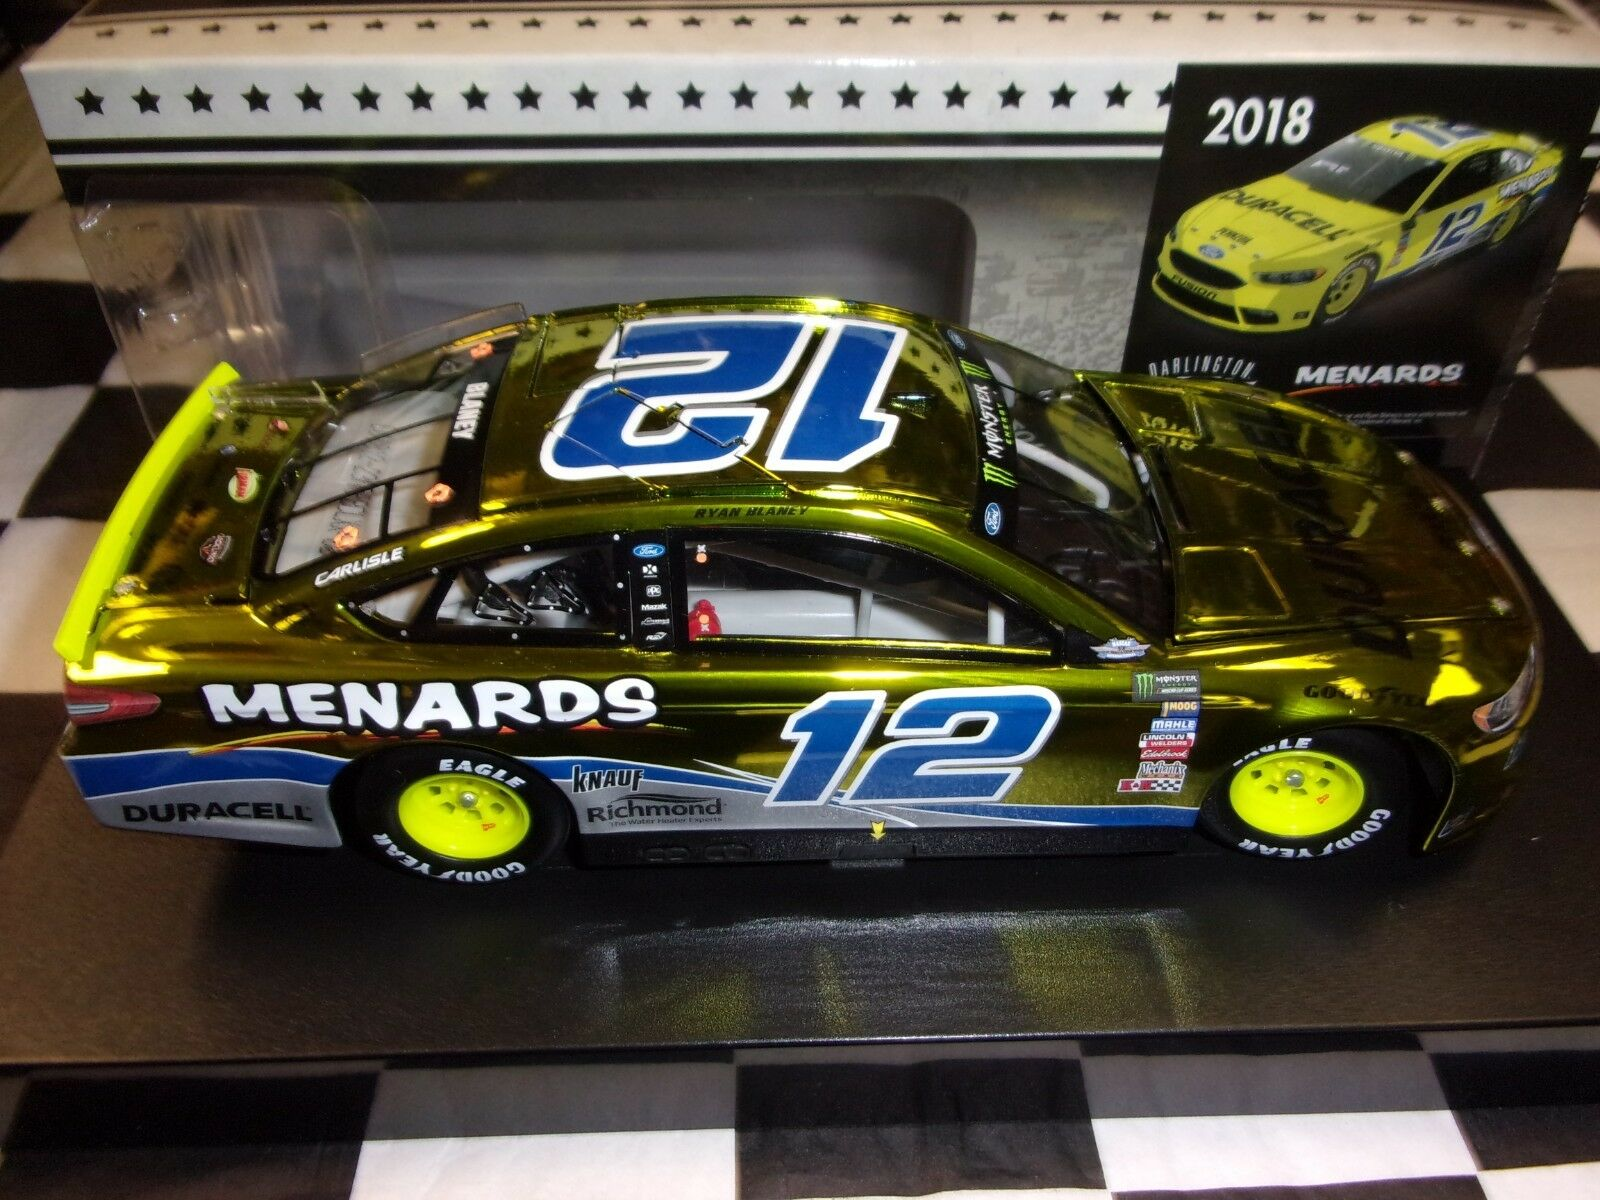 Ryan Blaney Menards Darlington 2018 1 1 1 24 Action NIB NASCAR ARC color Chrome a74084